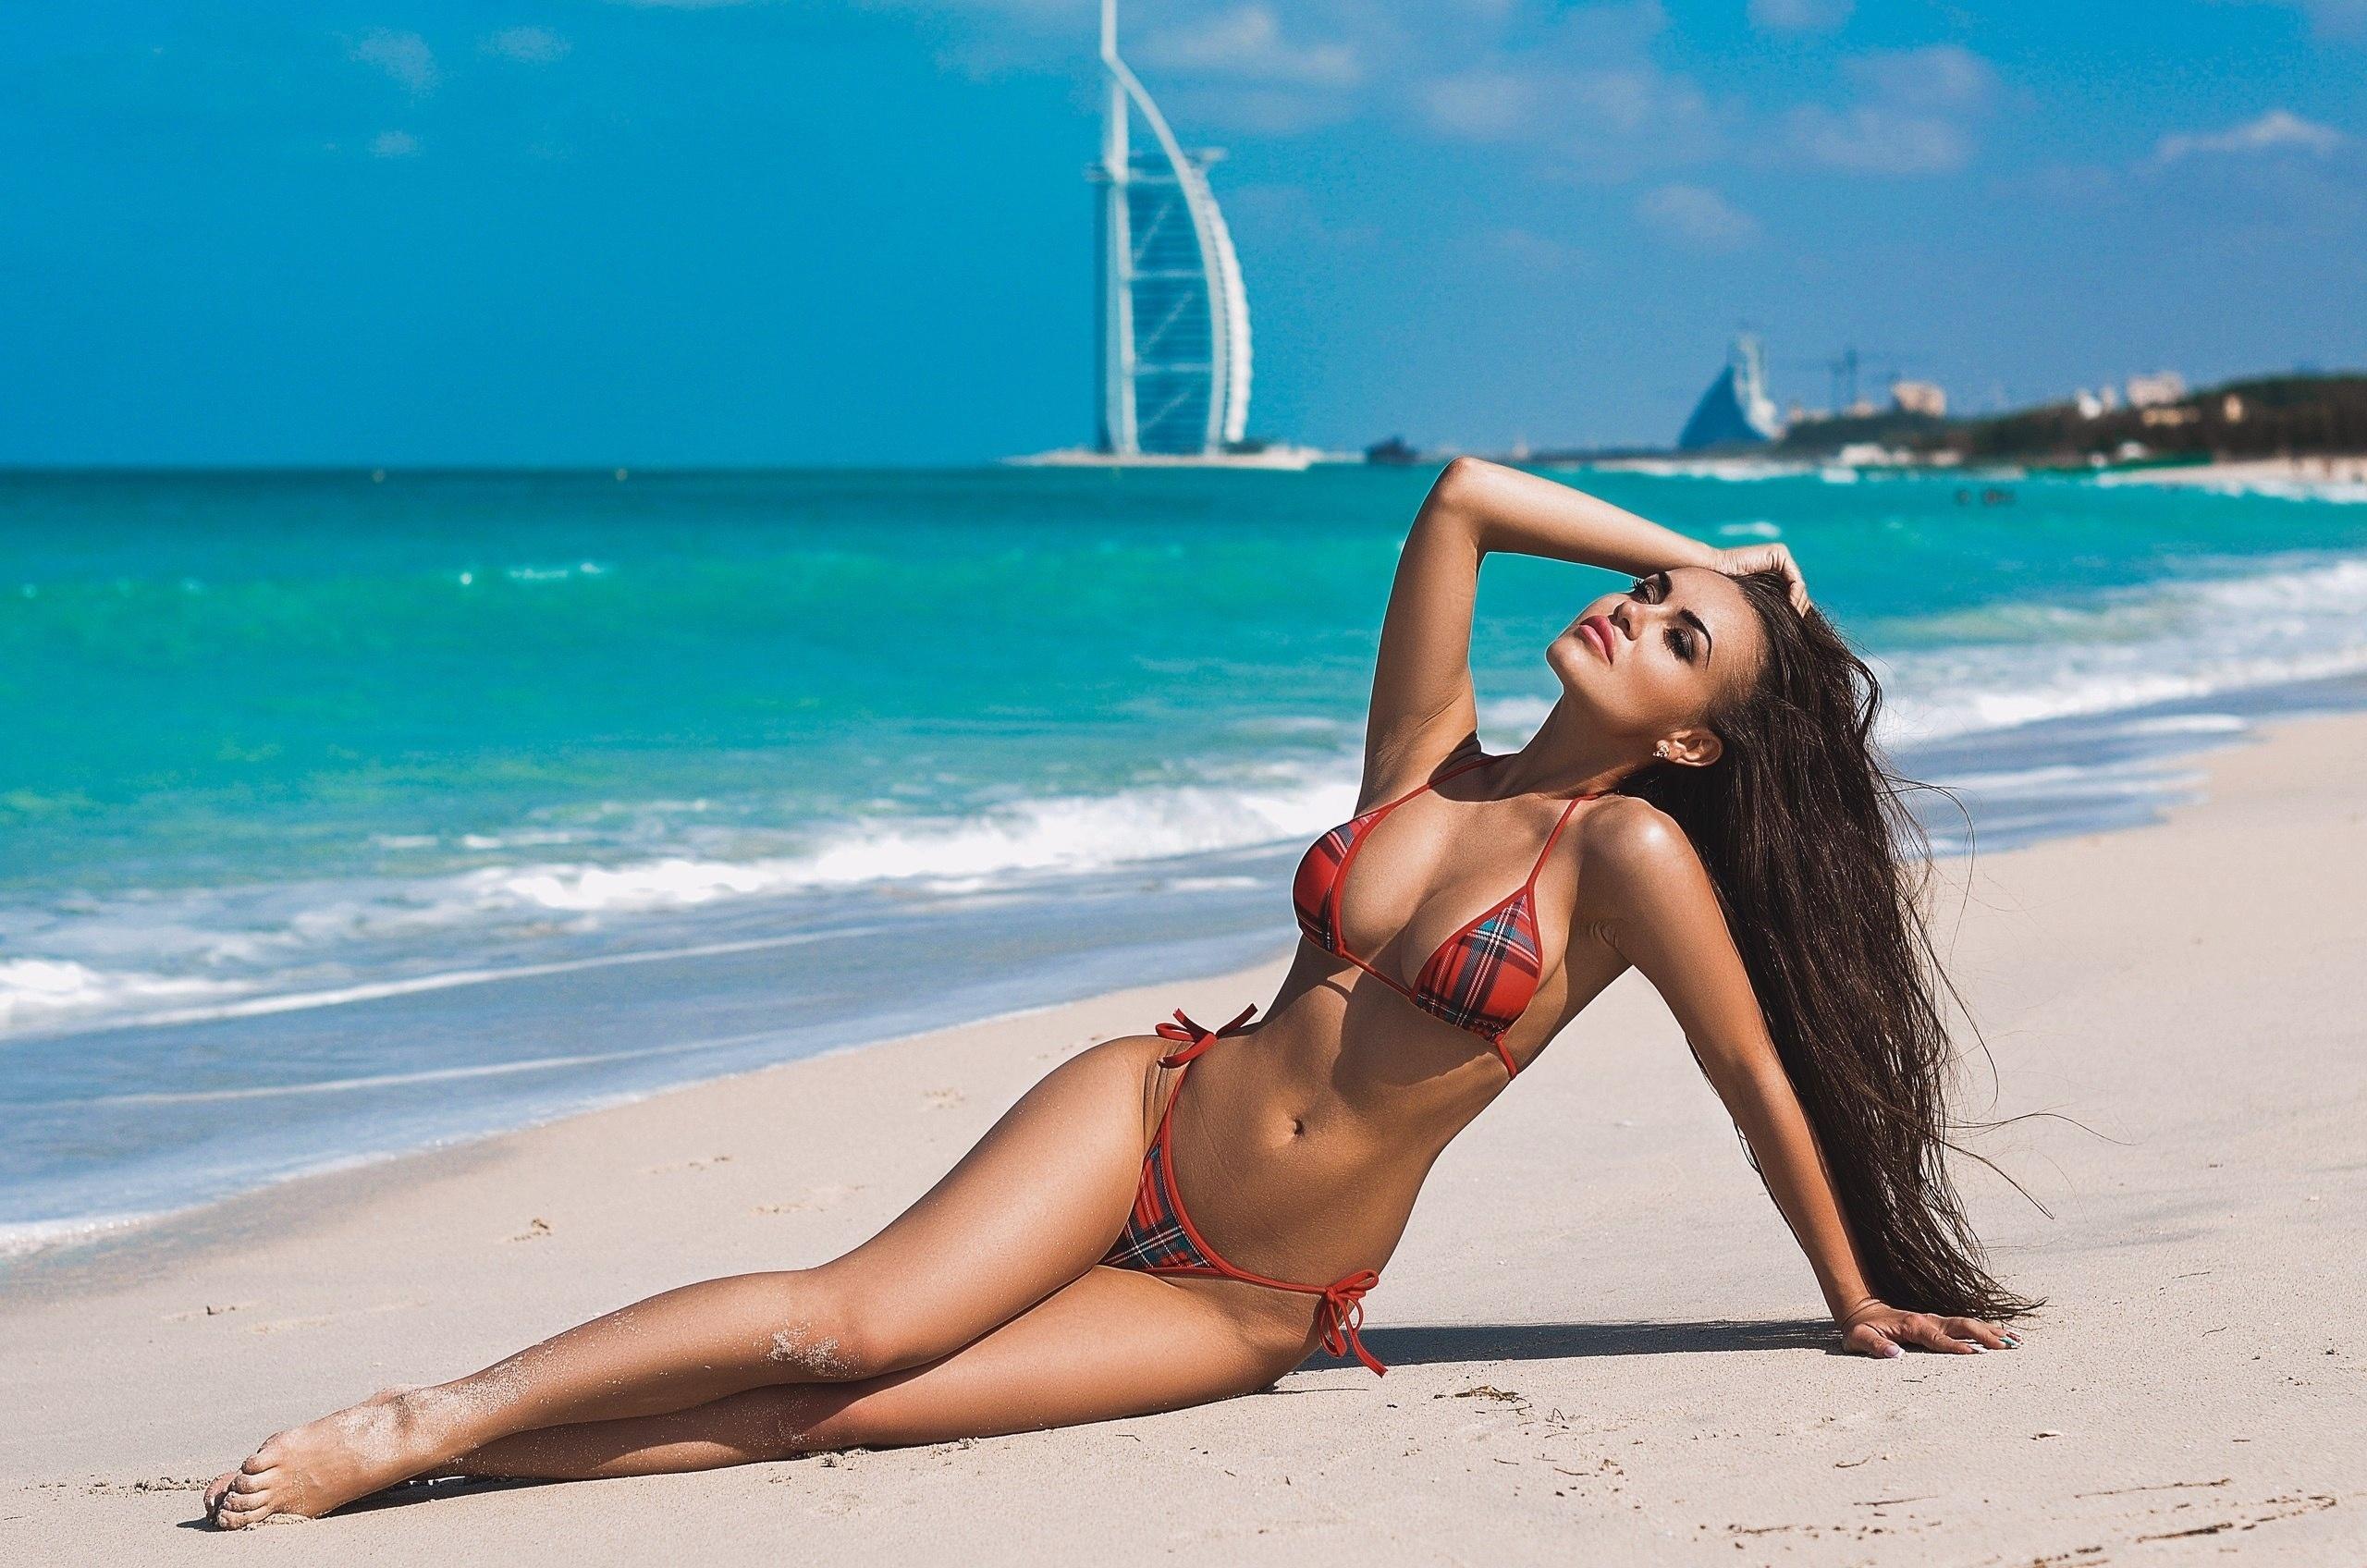 Девушки с красивыми фигурами отдыхают на море фото #15